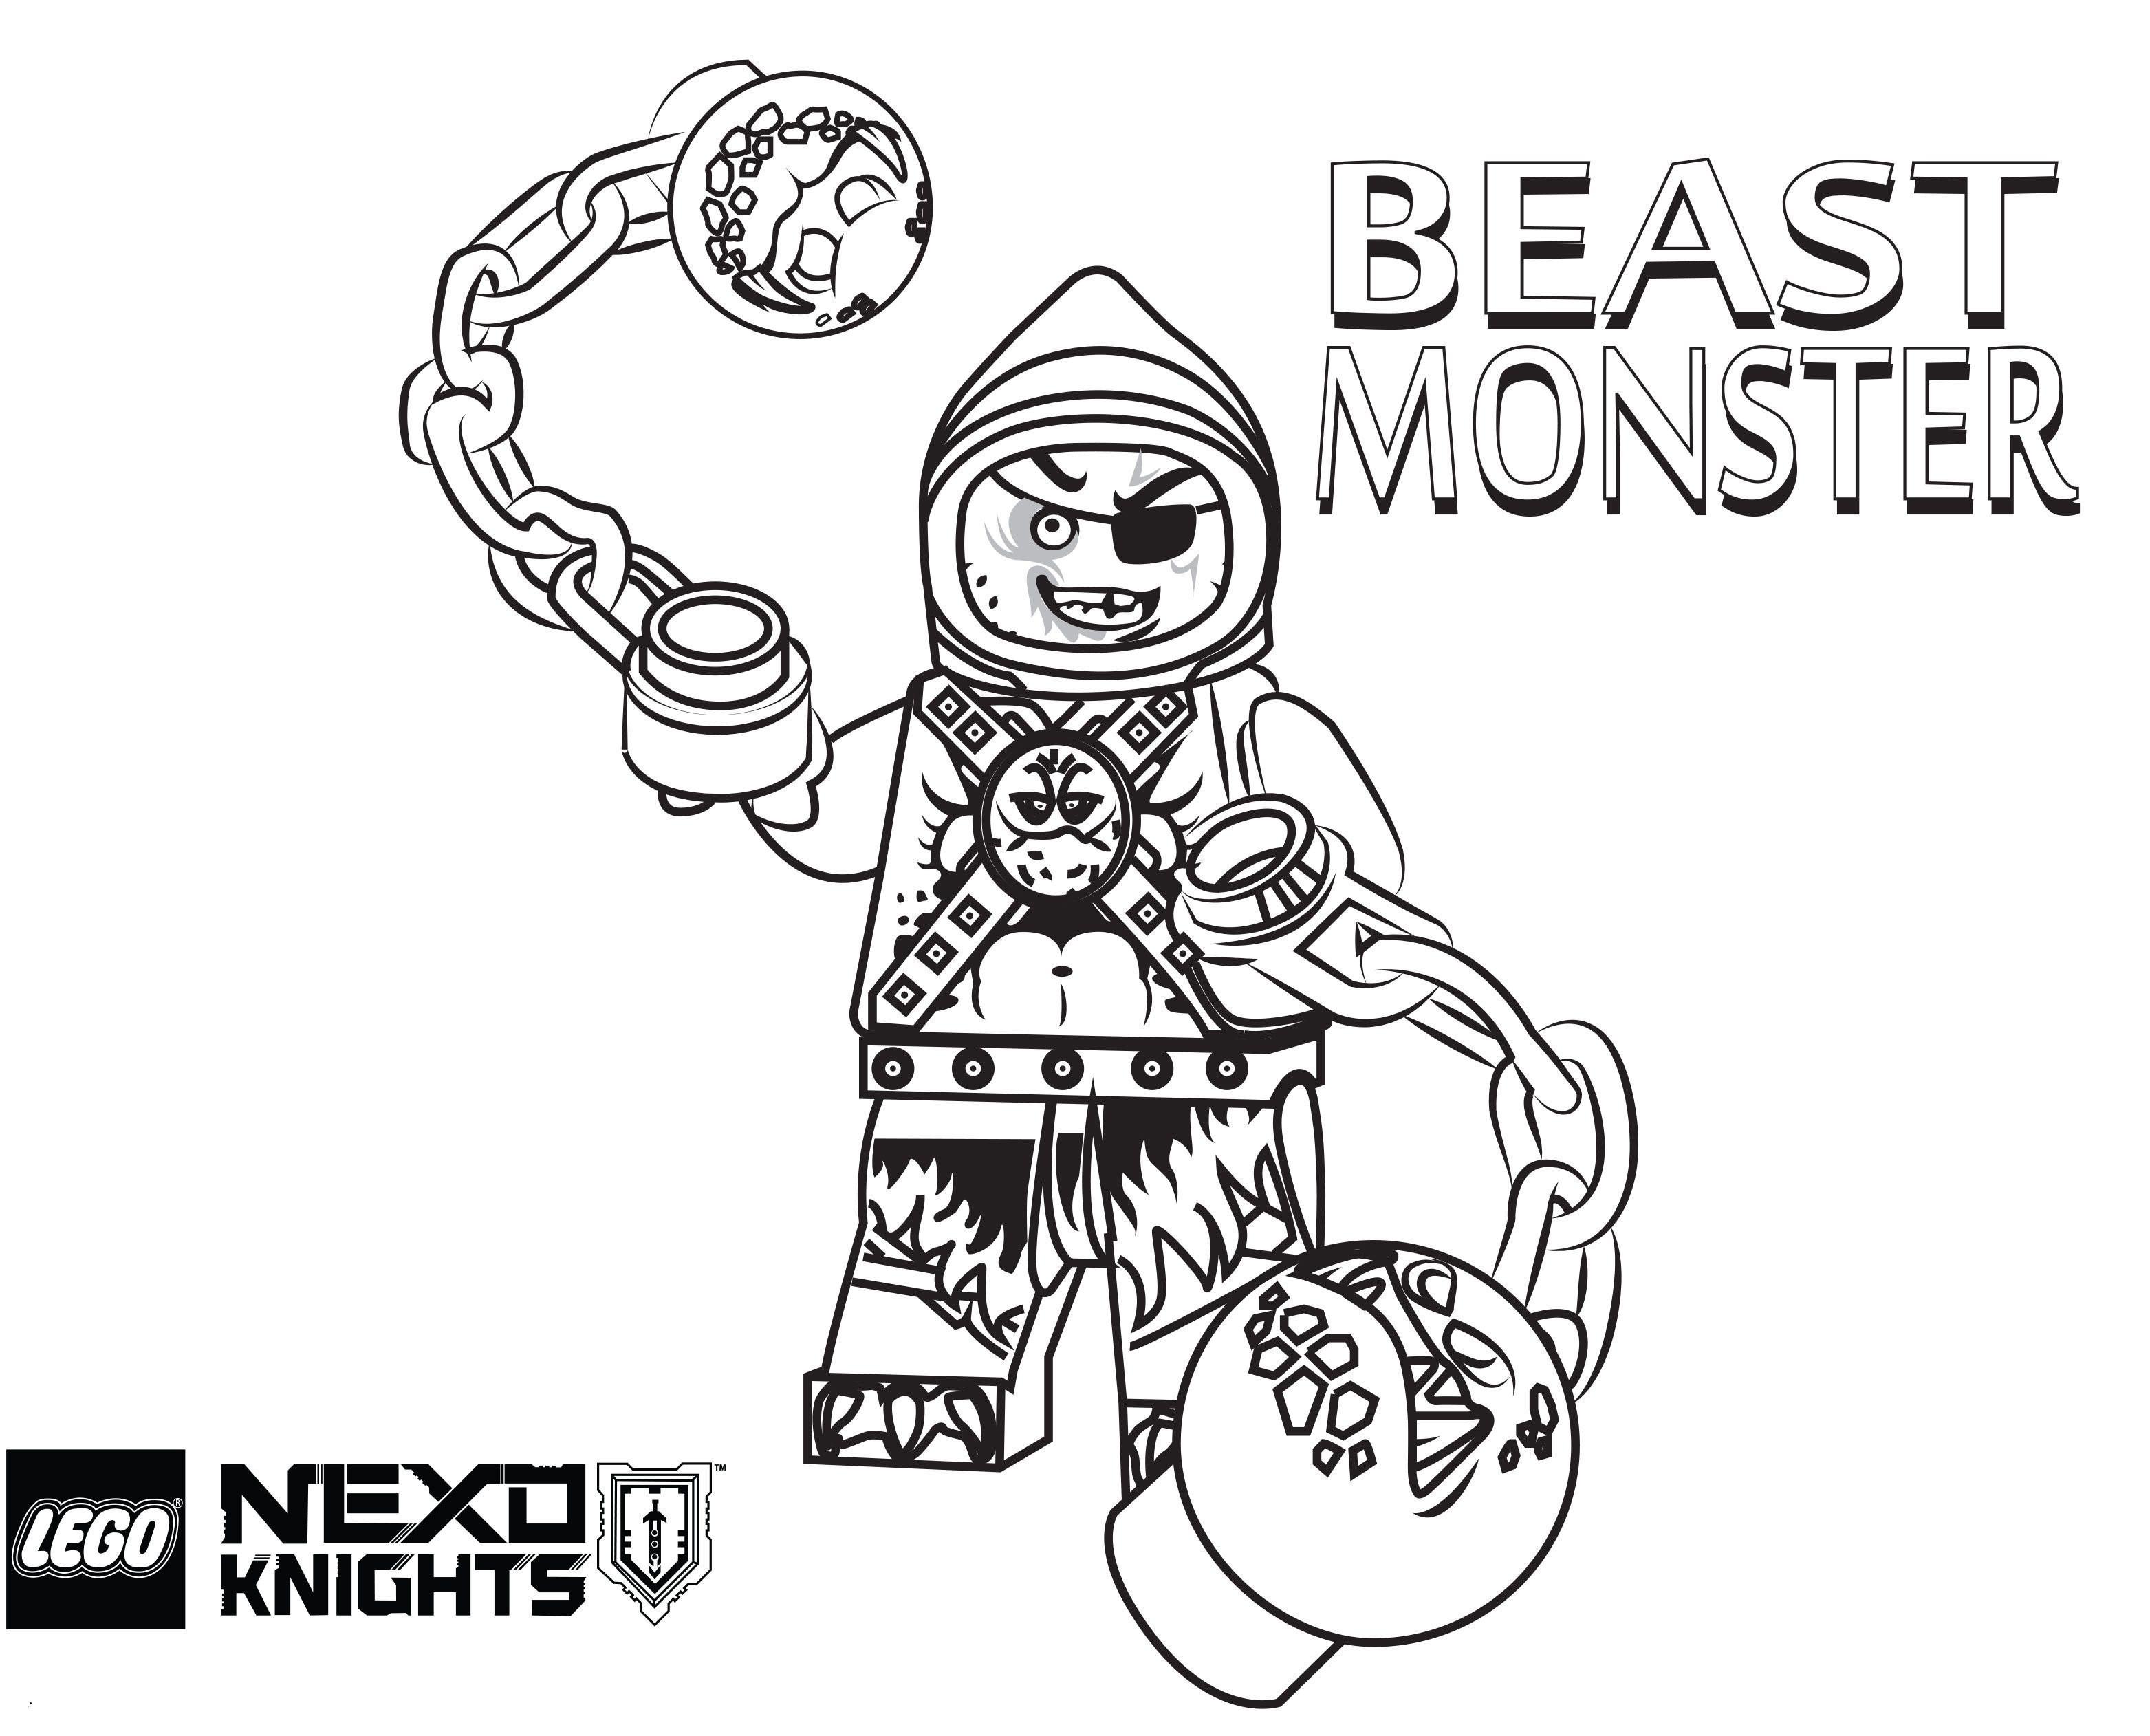 Ausmalbild Nexo Knights Einzigartig Lego Ausmalbilder Nexo Knights Uploadertalk Genial Ausmalbilder Nexo Fotos